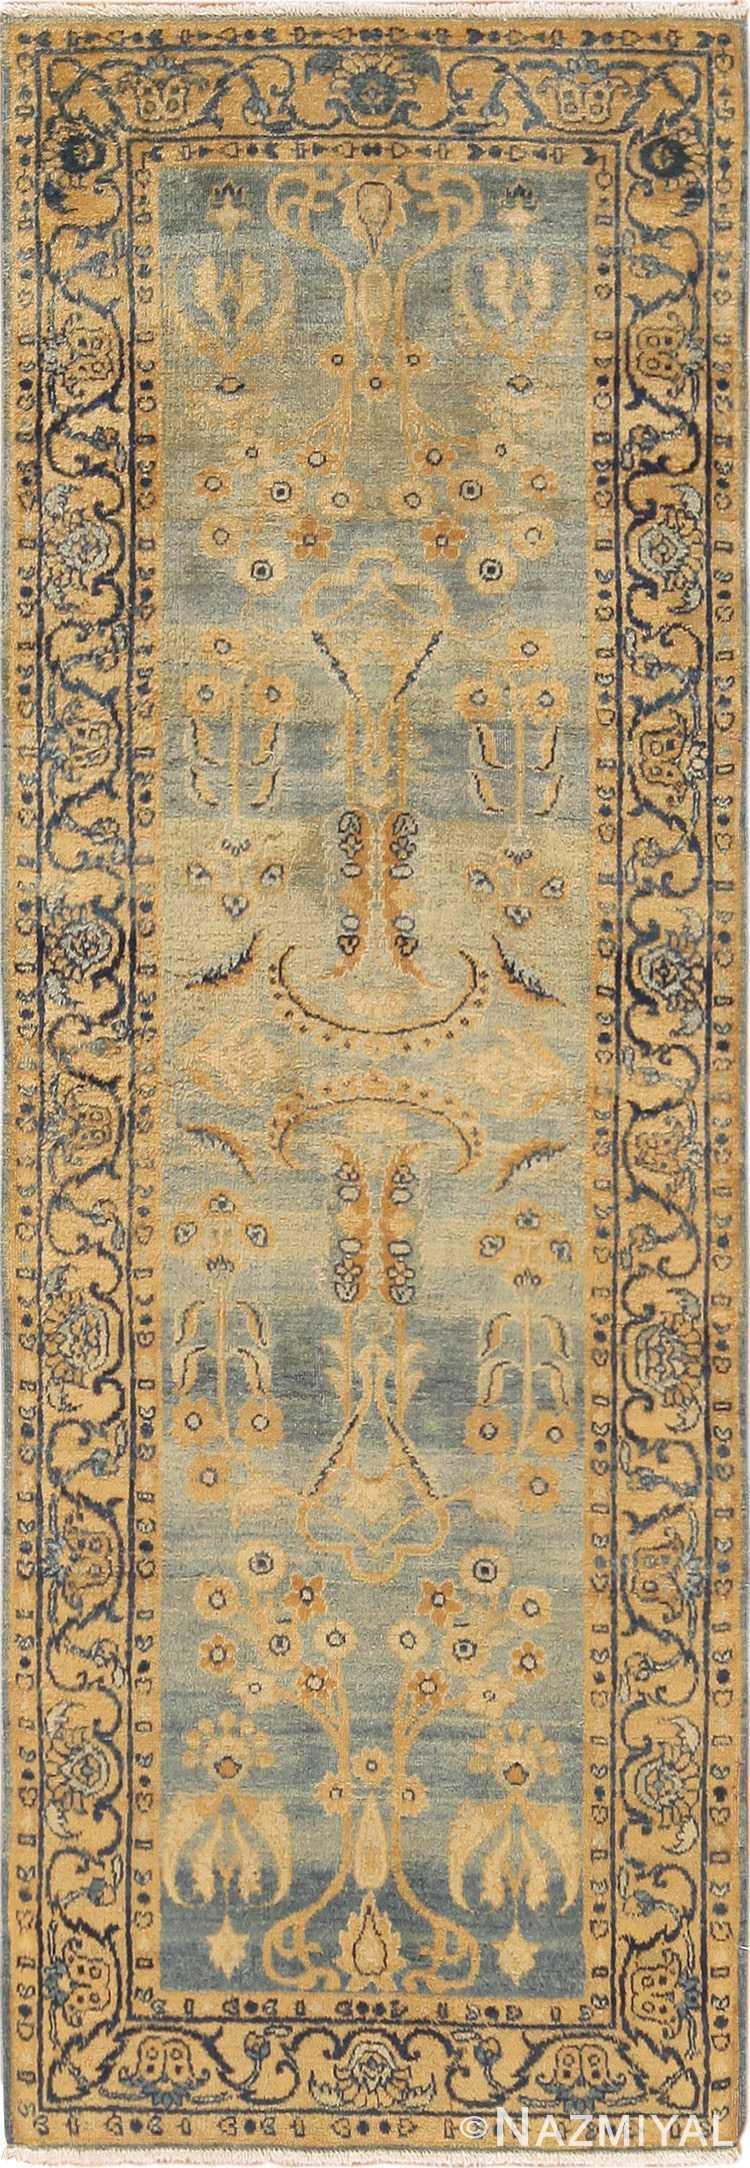 Full view Antique Persian Kerman rug 70163 by Nazmiyal